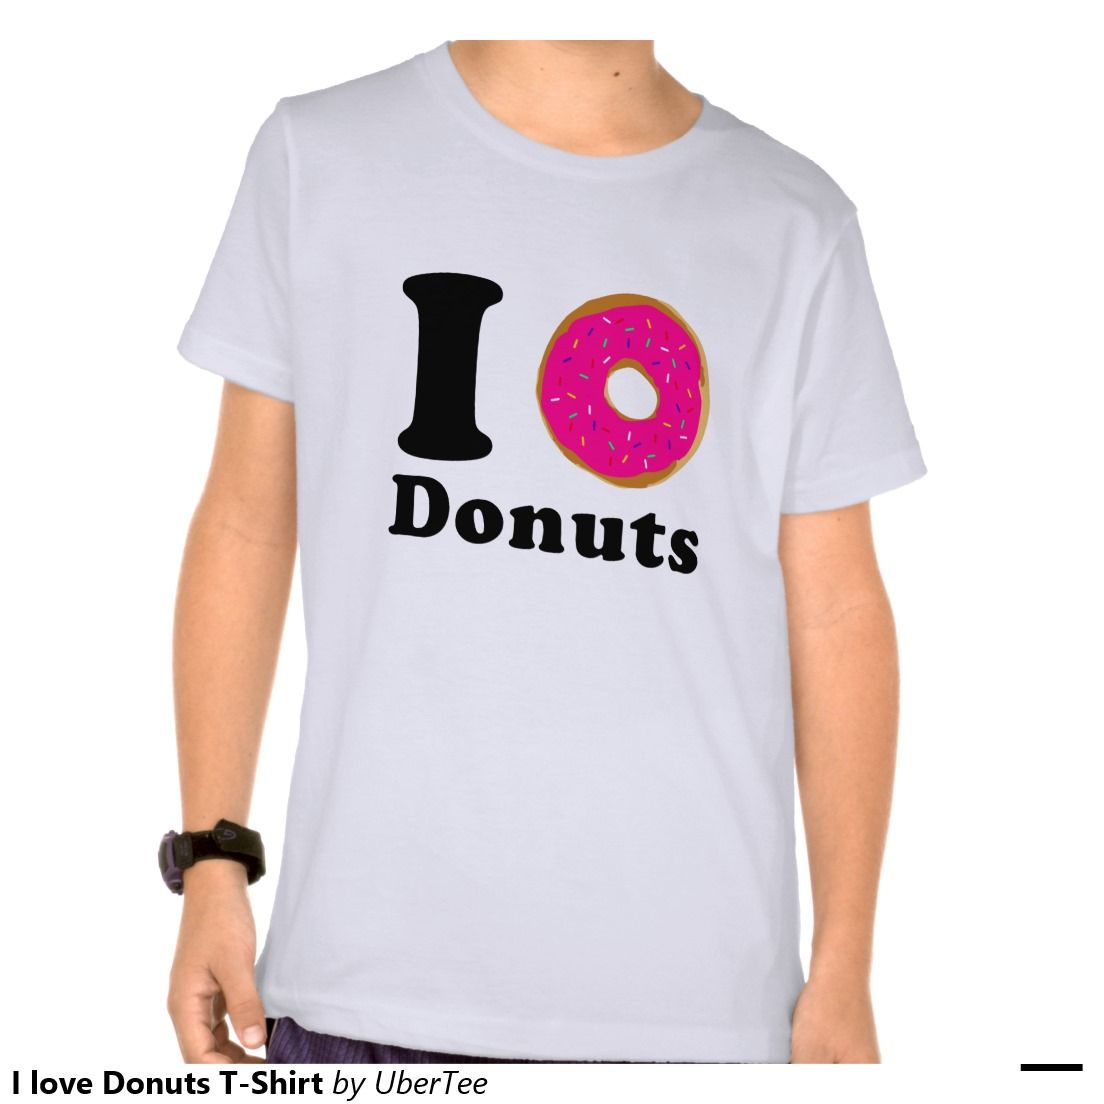 08a21809 I love Donuts Kid´s T-Shirt #donuts #donut #ilovedonuts #nationaldonutday  #tshirt #kid #doughnut